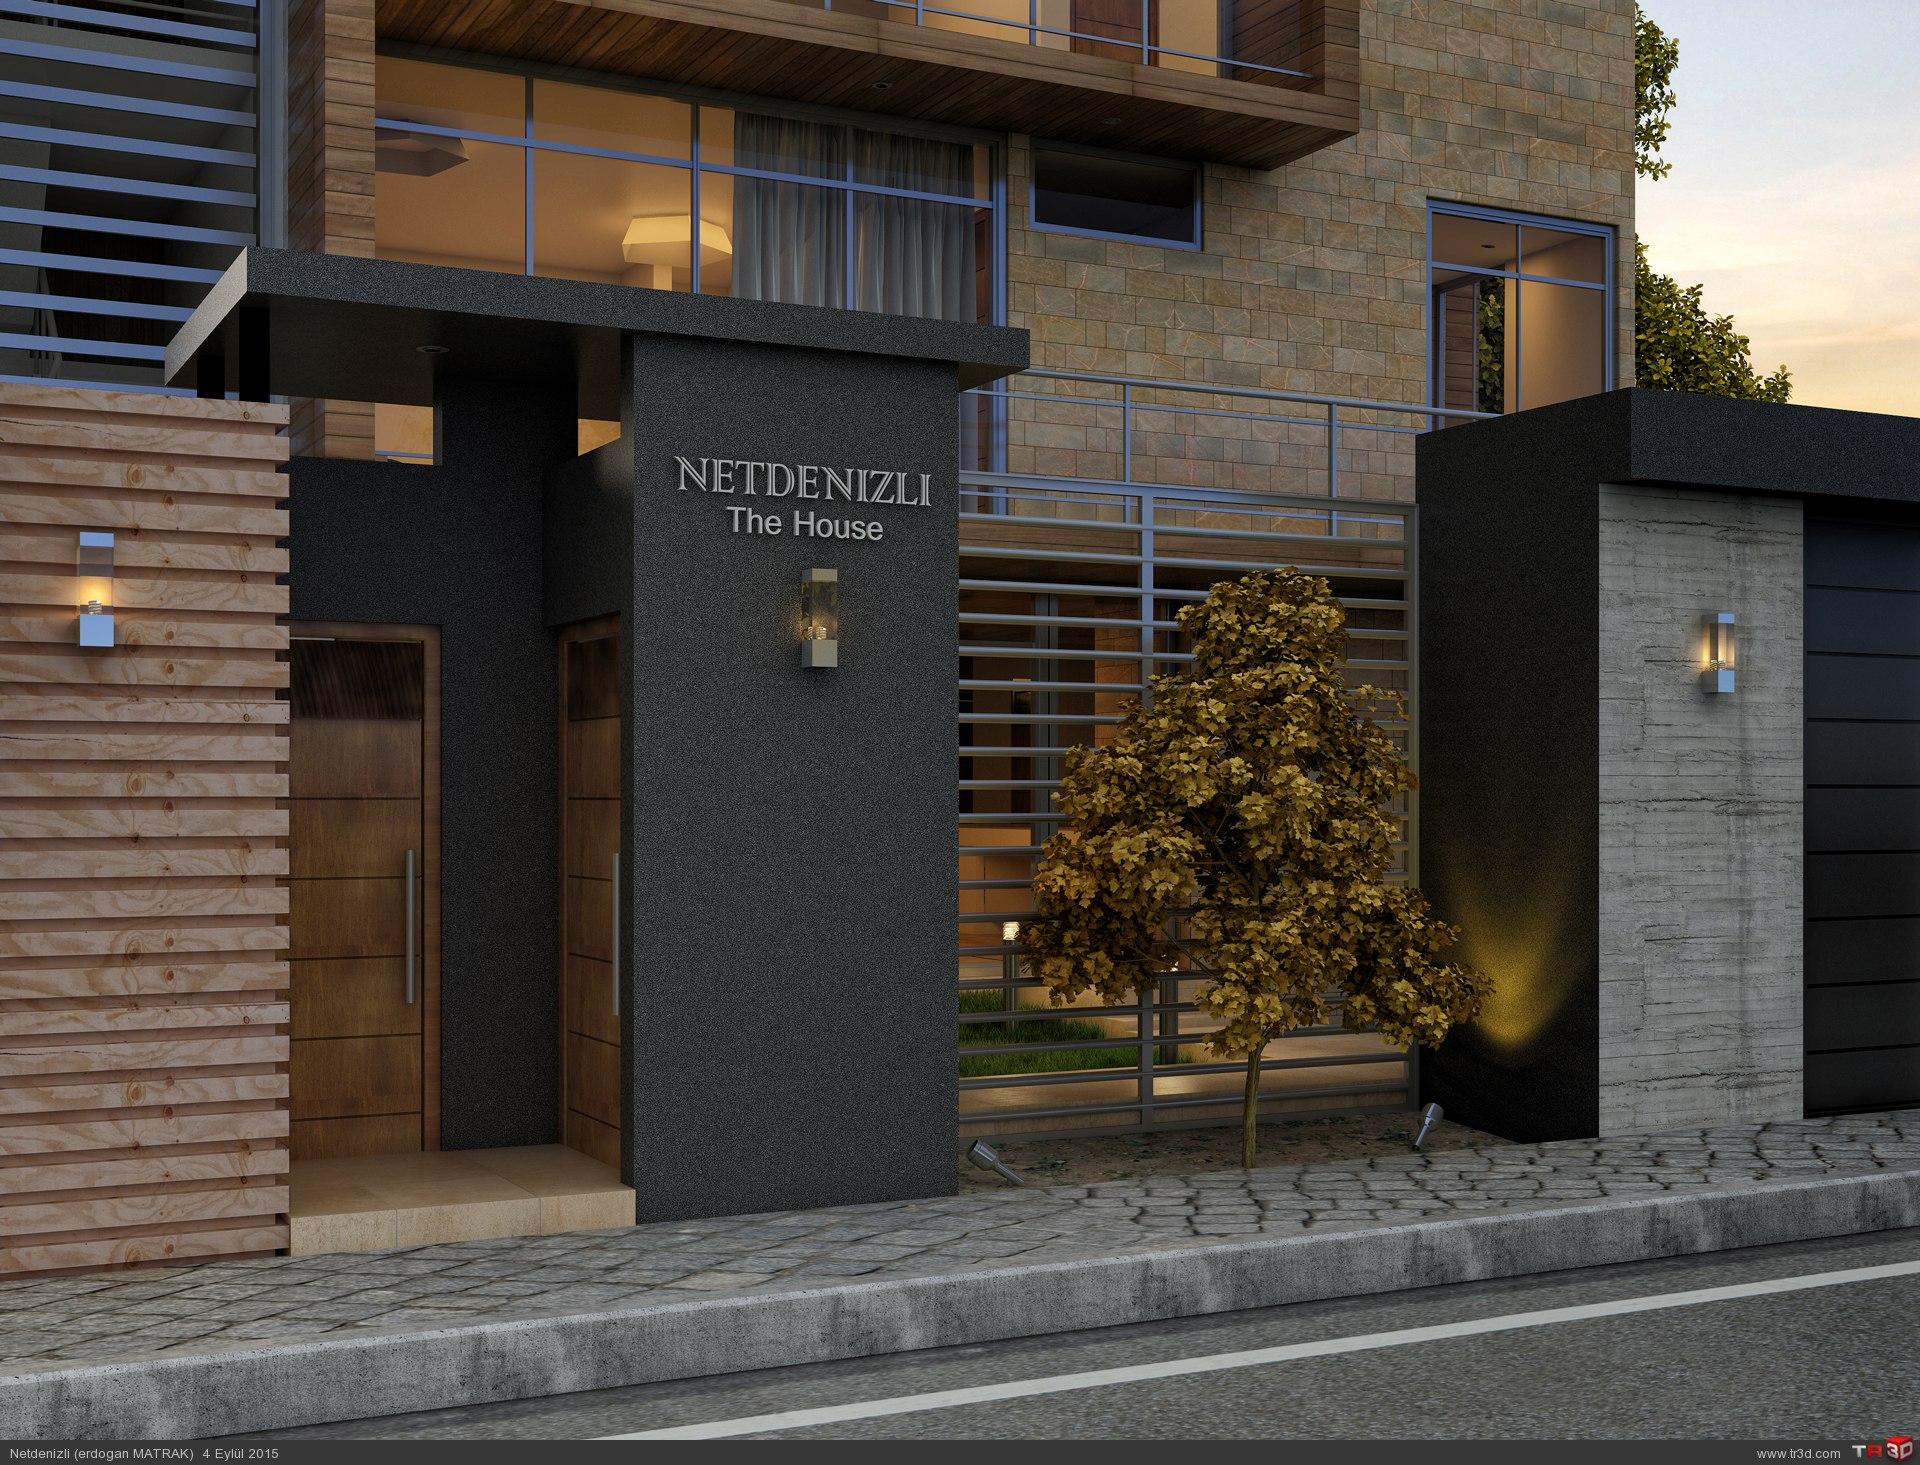 Netdenizli The House 2